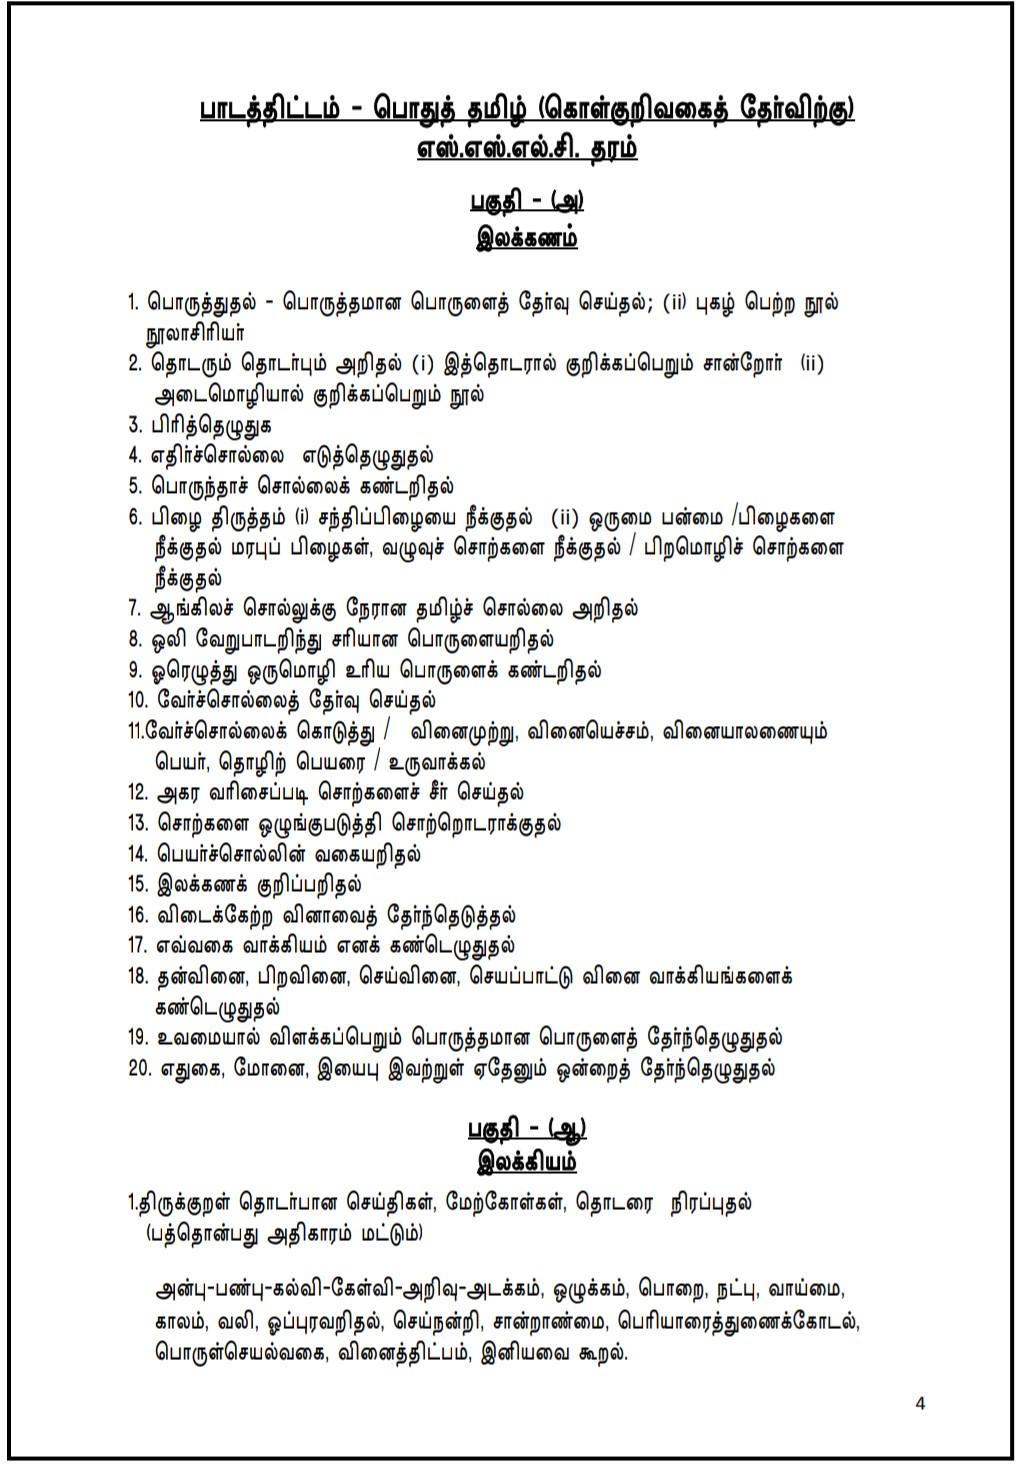 TNPSC Group 4 Syllabus | தமிழ்நாடு பொது சேவை ஆணையம் TNPSC குரூப் 4 -பாடத்திட்டம் |_70.1